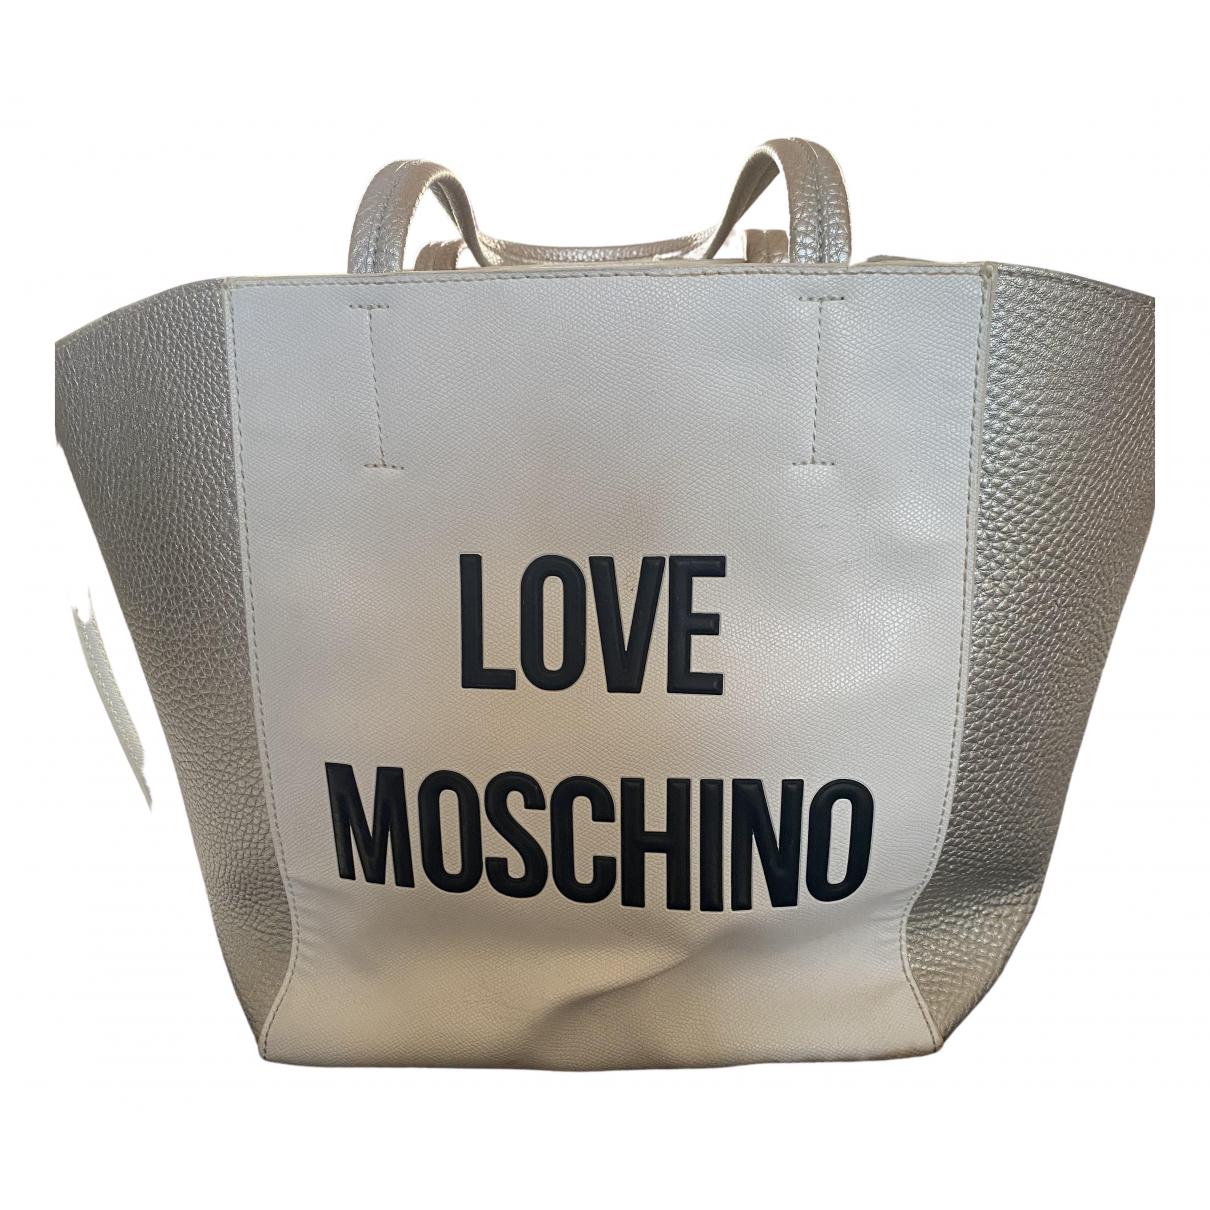 Moschino Love - Sac de voyage   pour femme - blanc